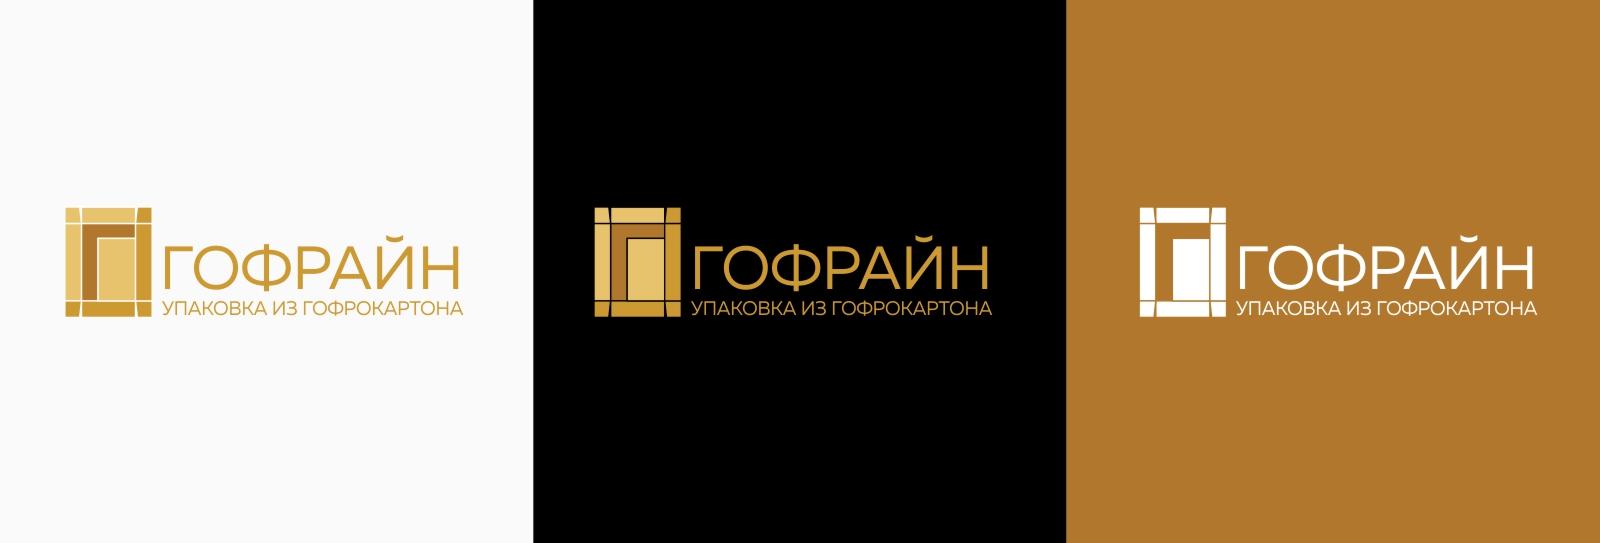 Логотип для компании по реализации упаковки из гофрокартона фото f_8025cdec71922b47.jpg